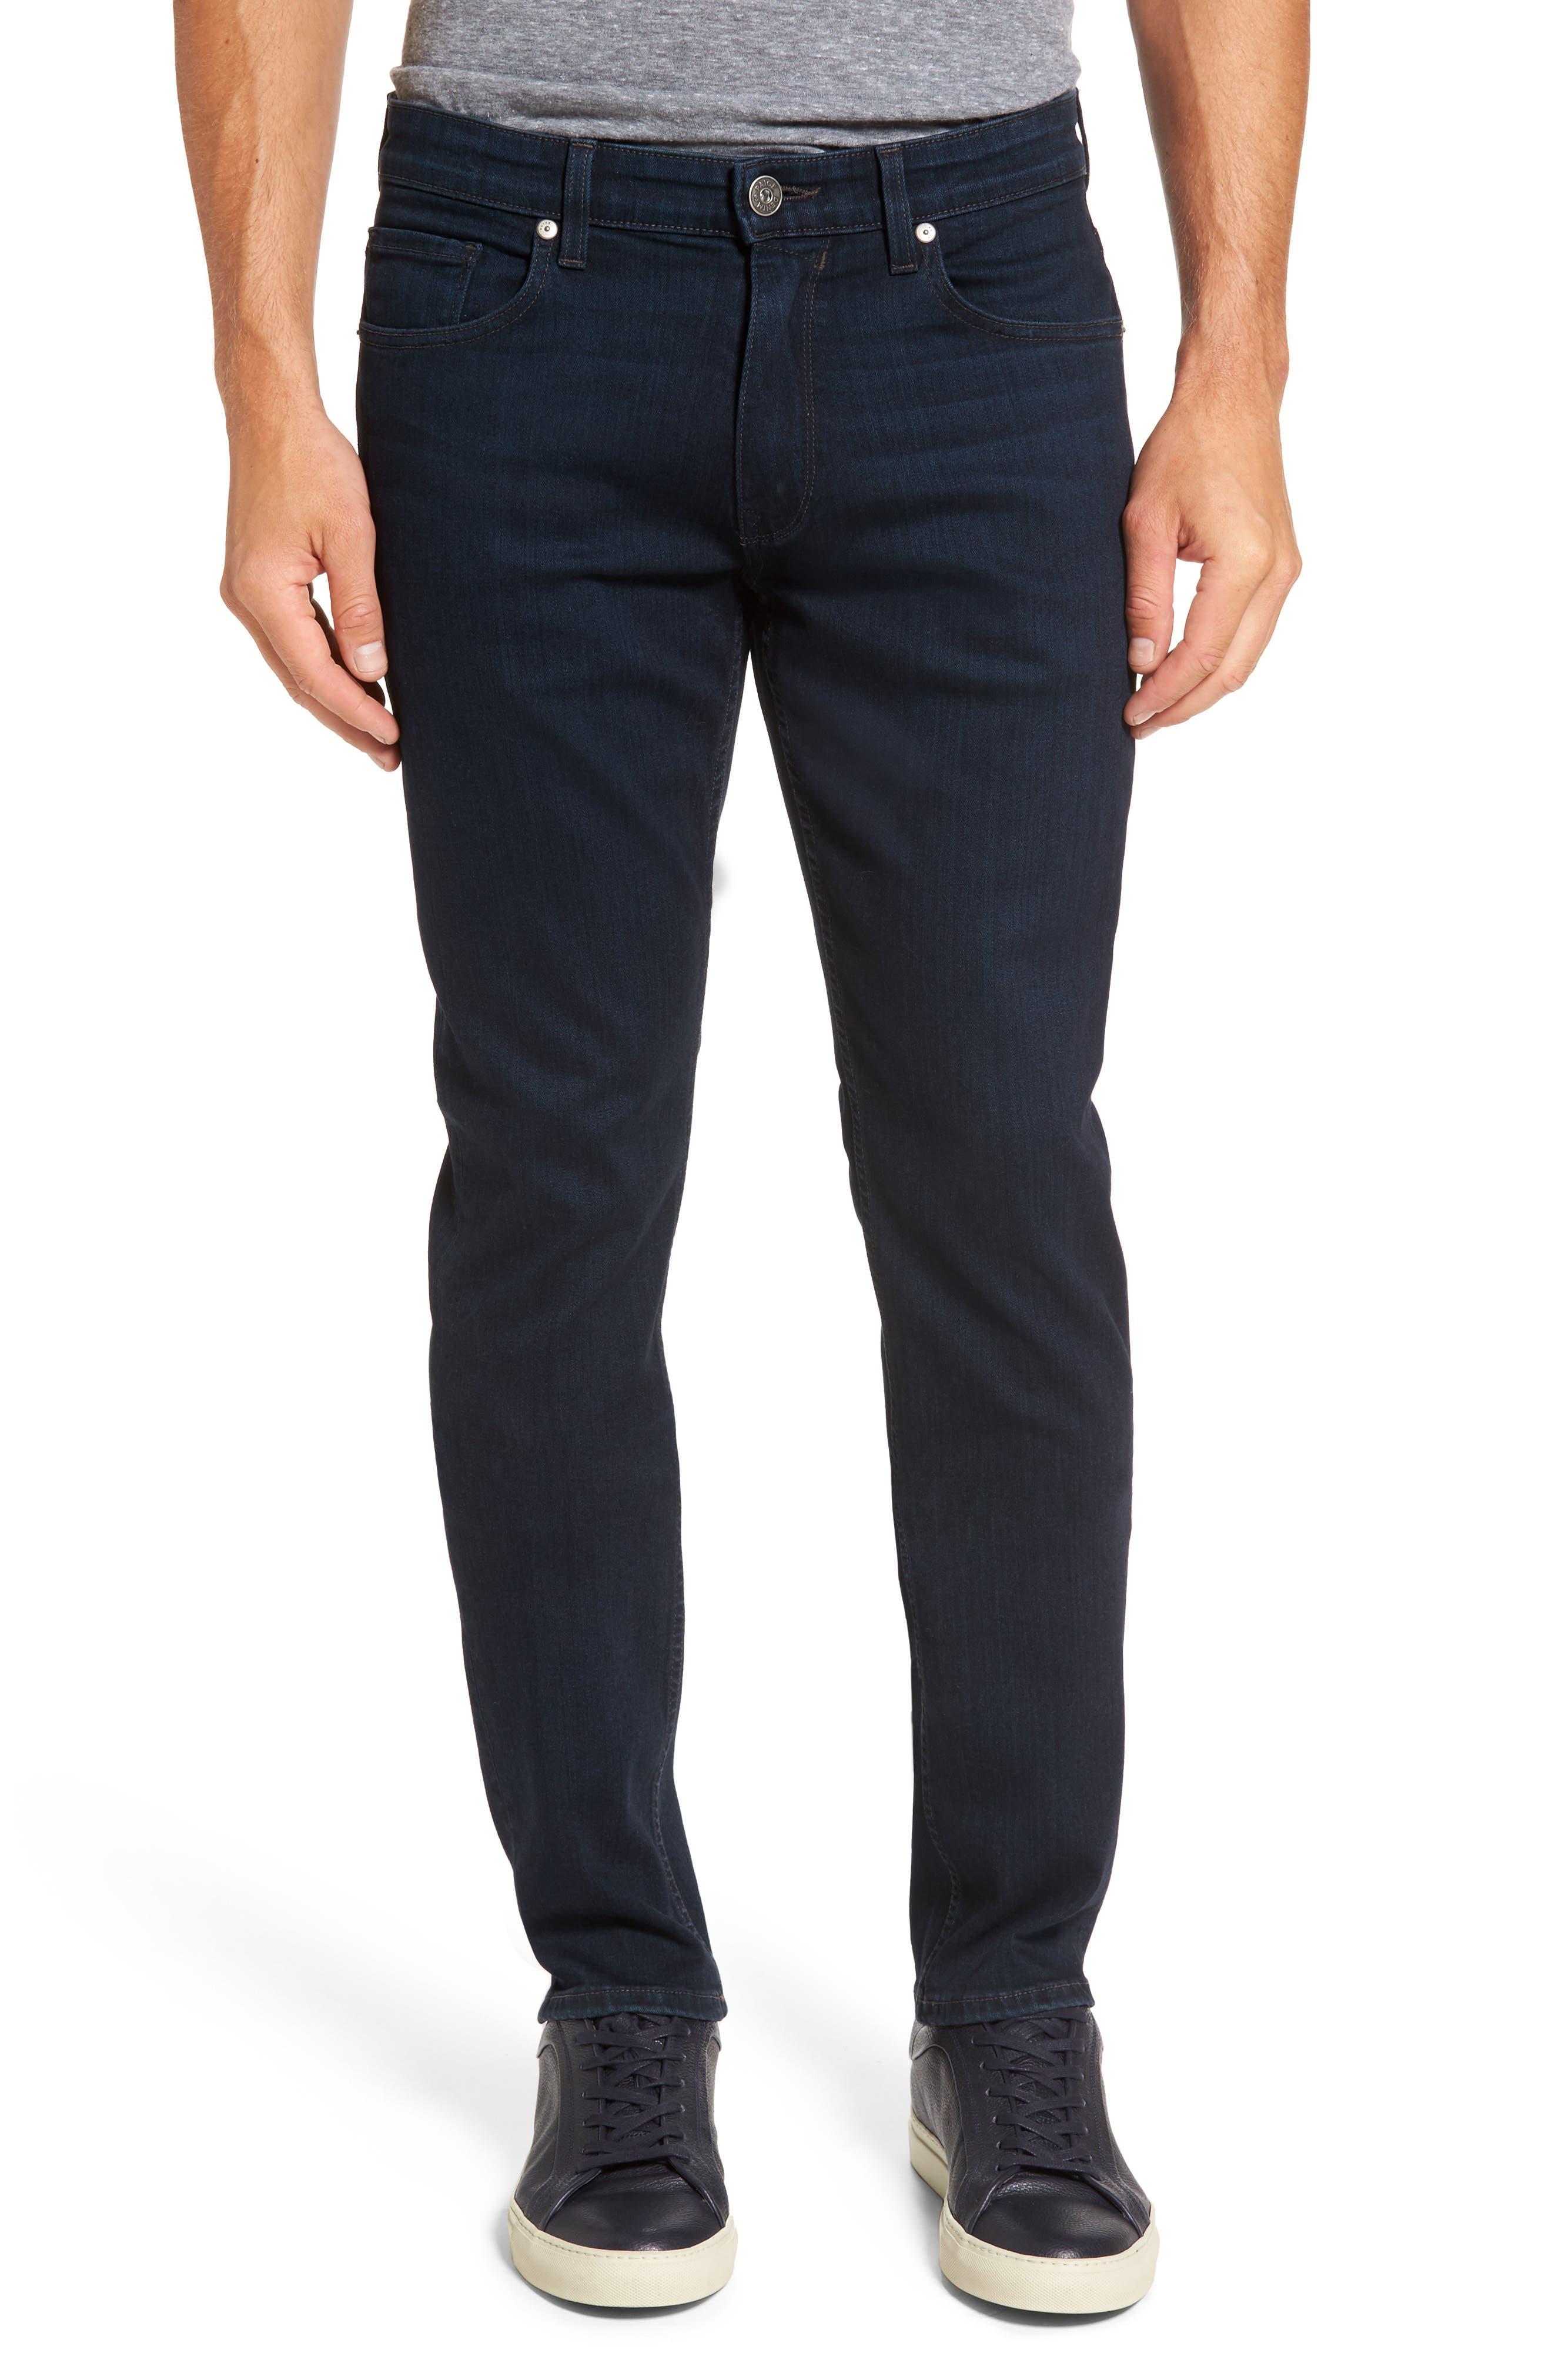 PAIGE, Normandie Straight Leg Jeans, Main thumbnail 1, color, ARLO